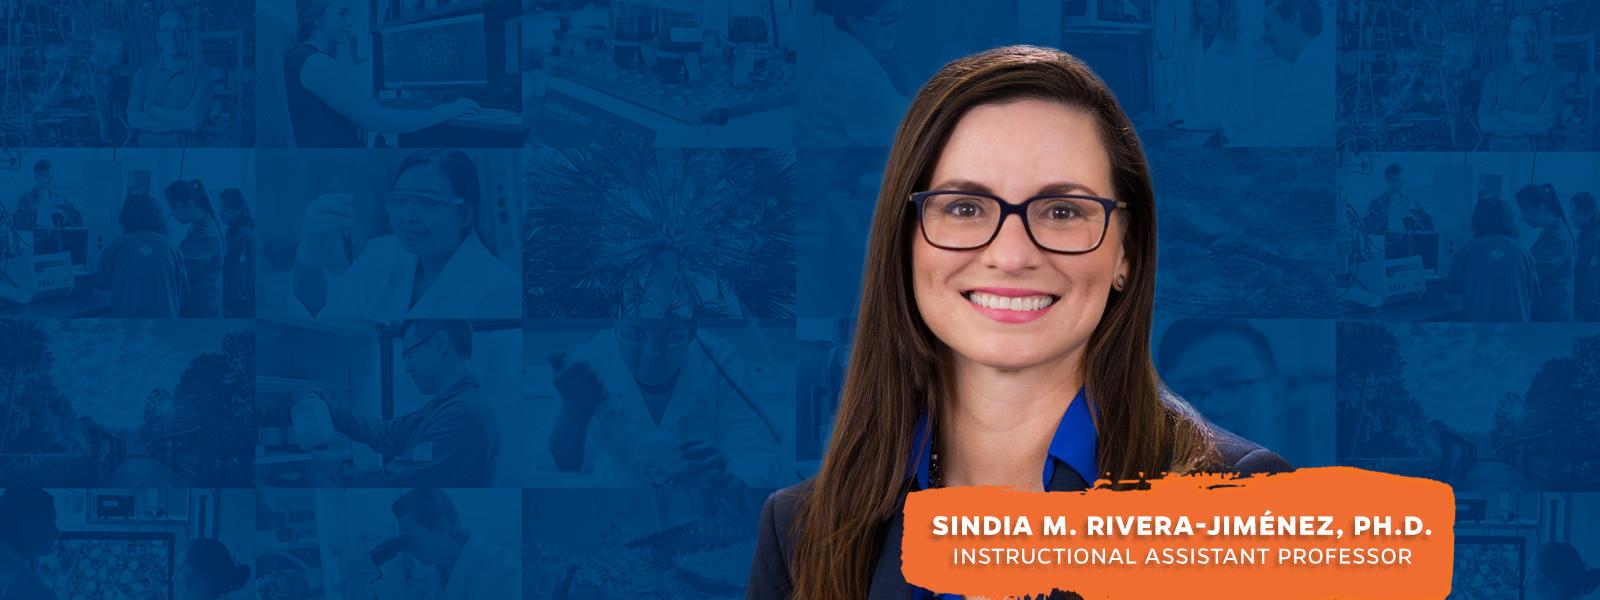 Sindia Rivera-Jimenez, Ph.D.